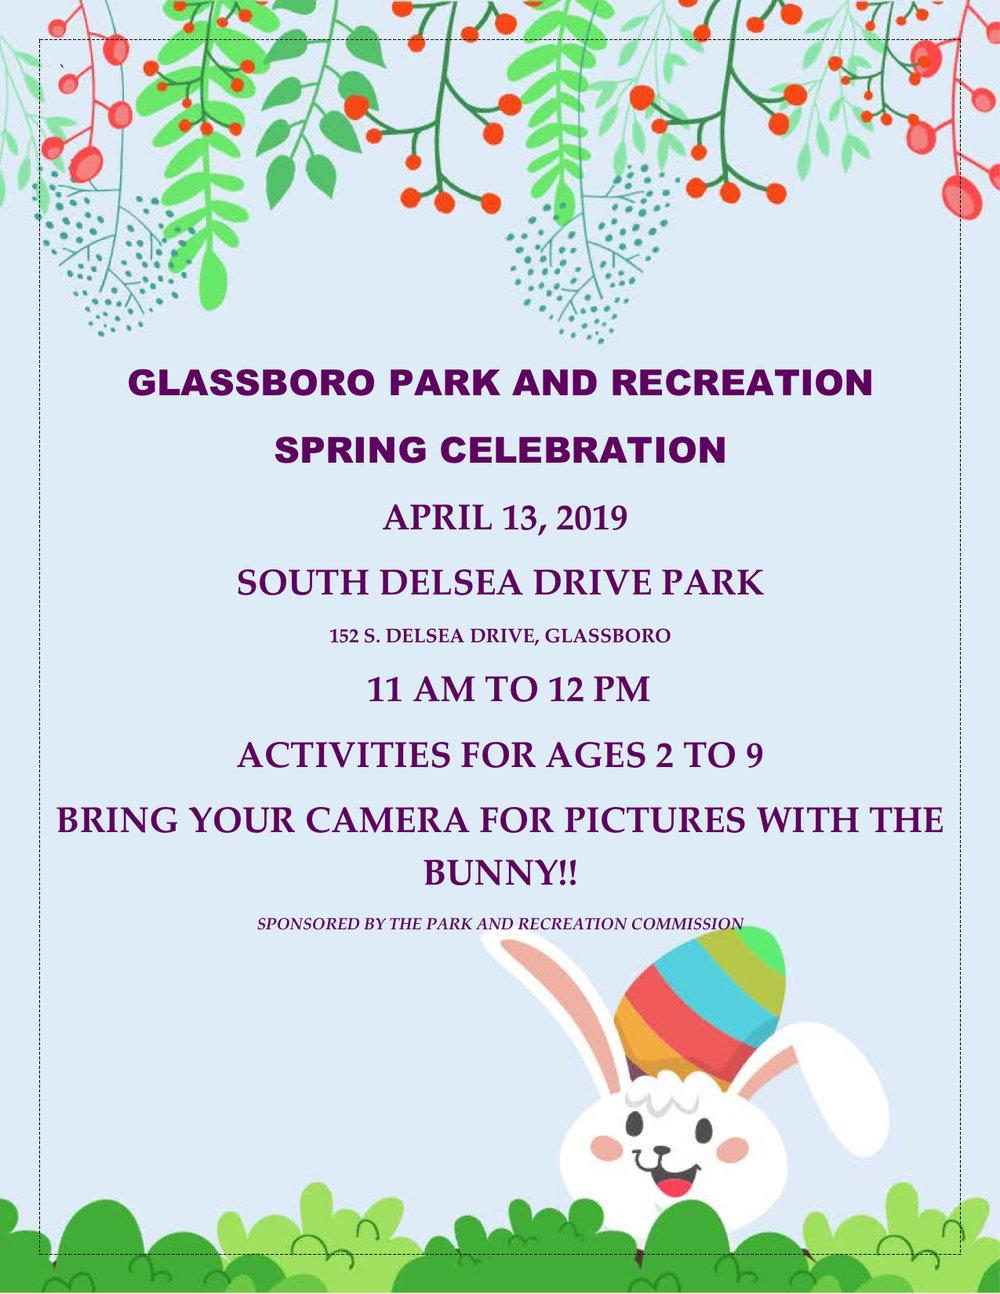 glassboro park and rec SPRING CELEBRATION 2019.jpeg